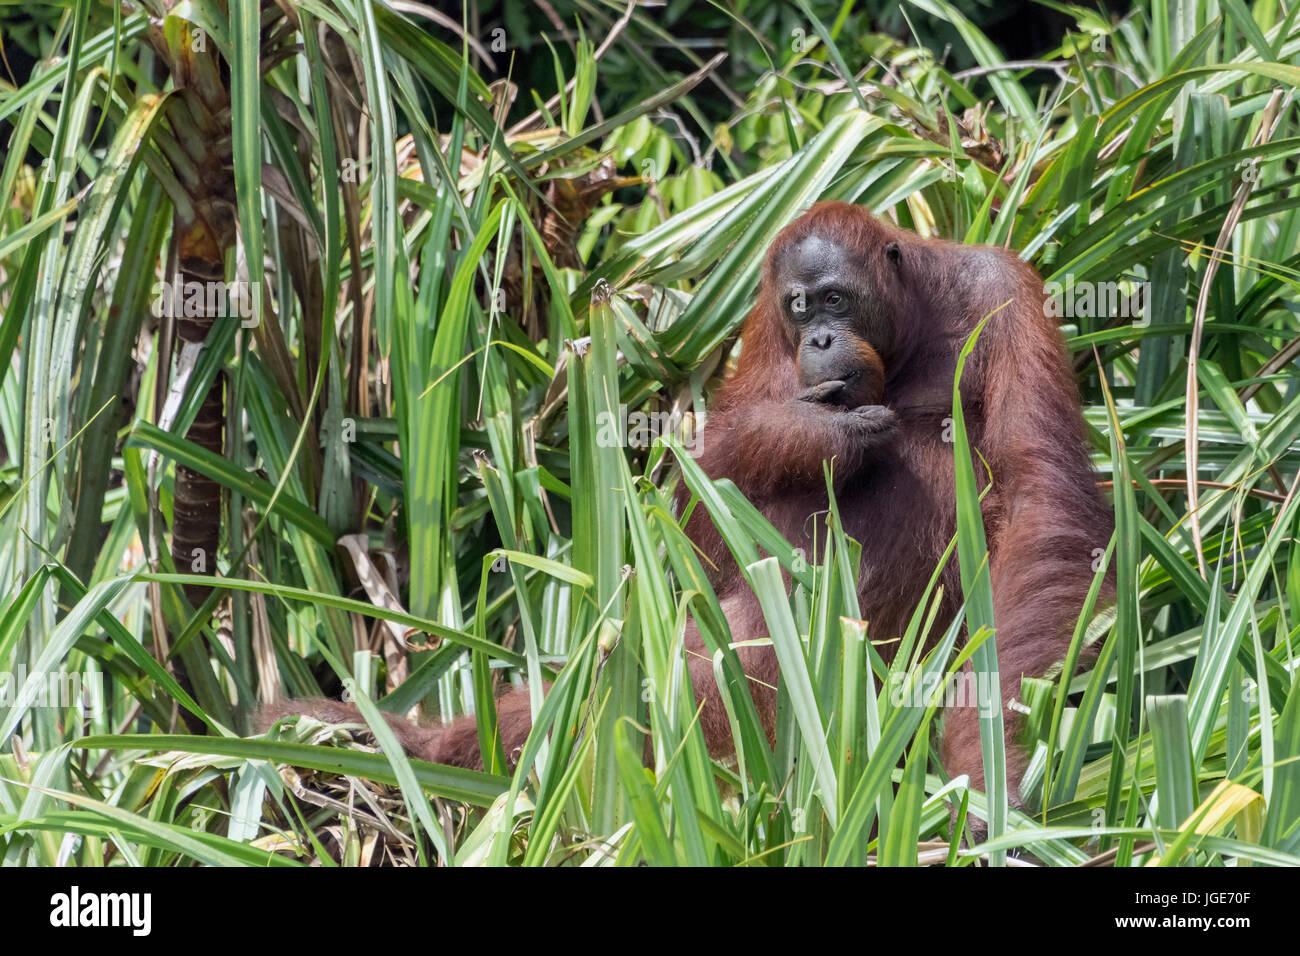 Orangutan sitting in a clump of Pandanus palms by the riverside, Sekonyer River, Tanjung Puting National Park, Indonesia - Stock Image